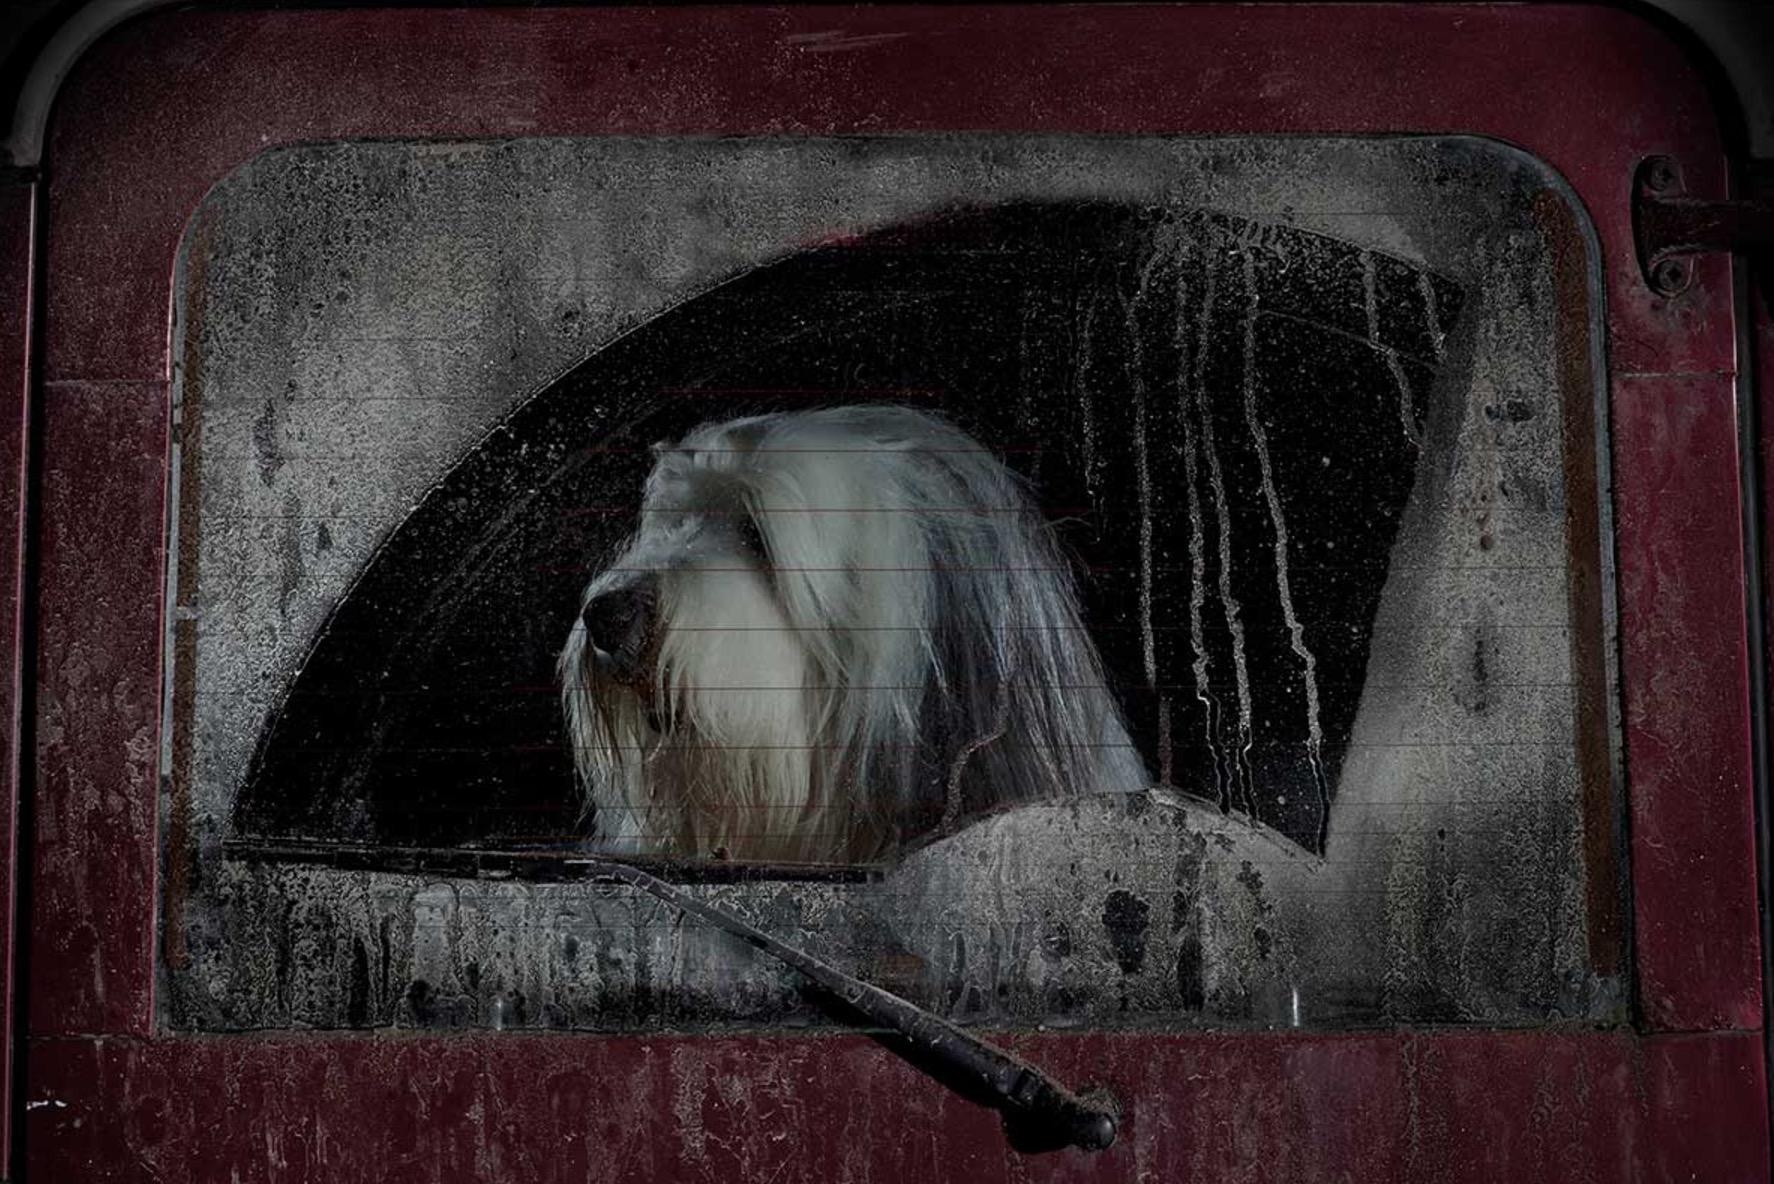 Martin-Usborne-photographe-chiens-voitures-8